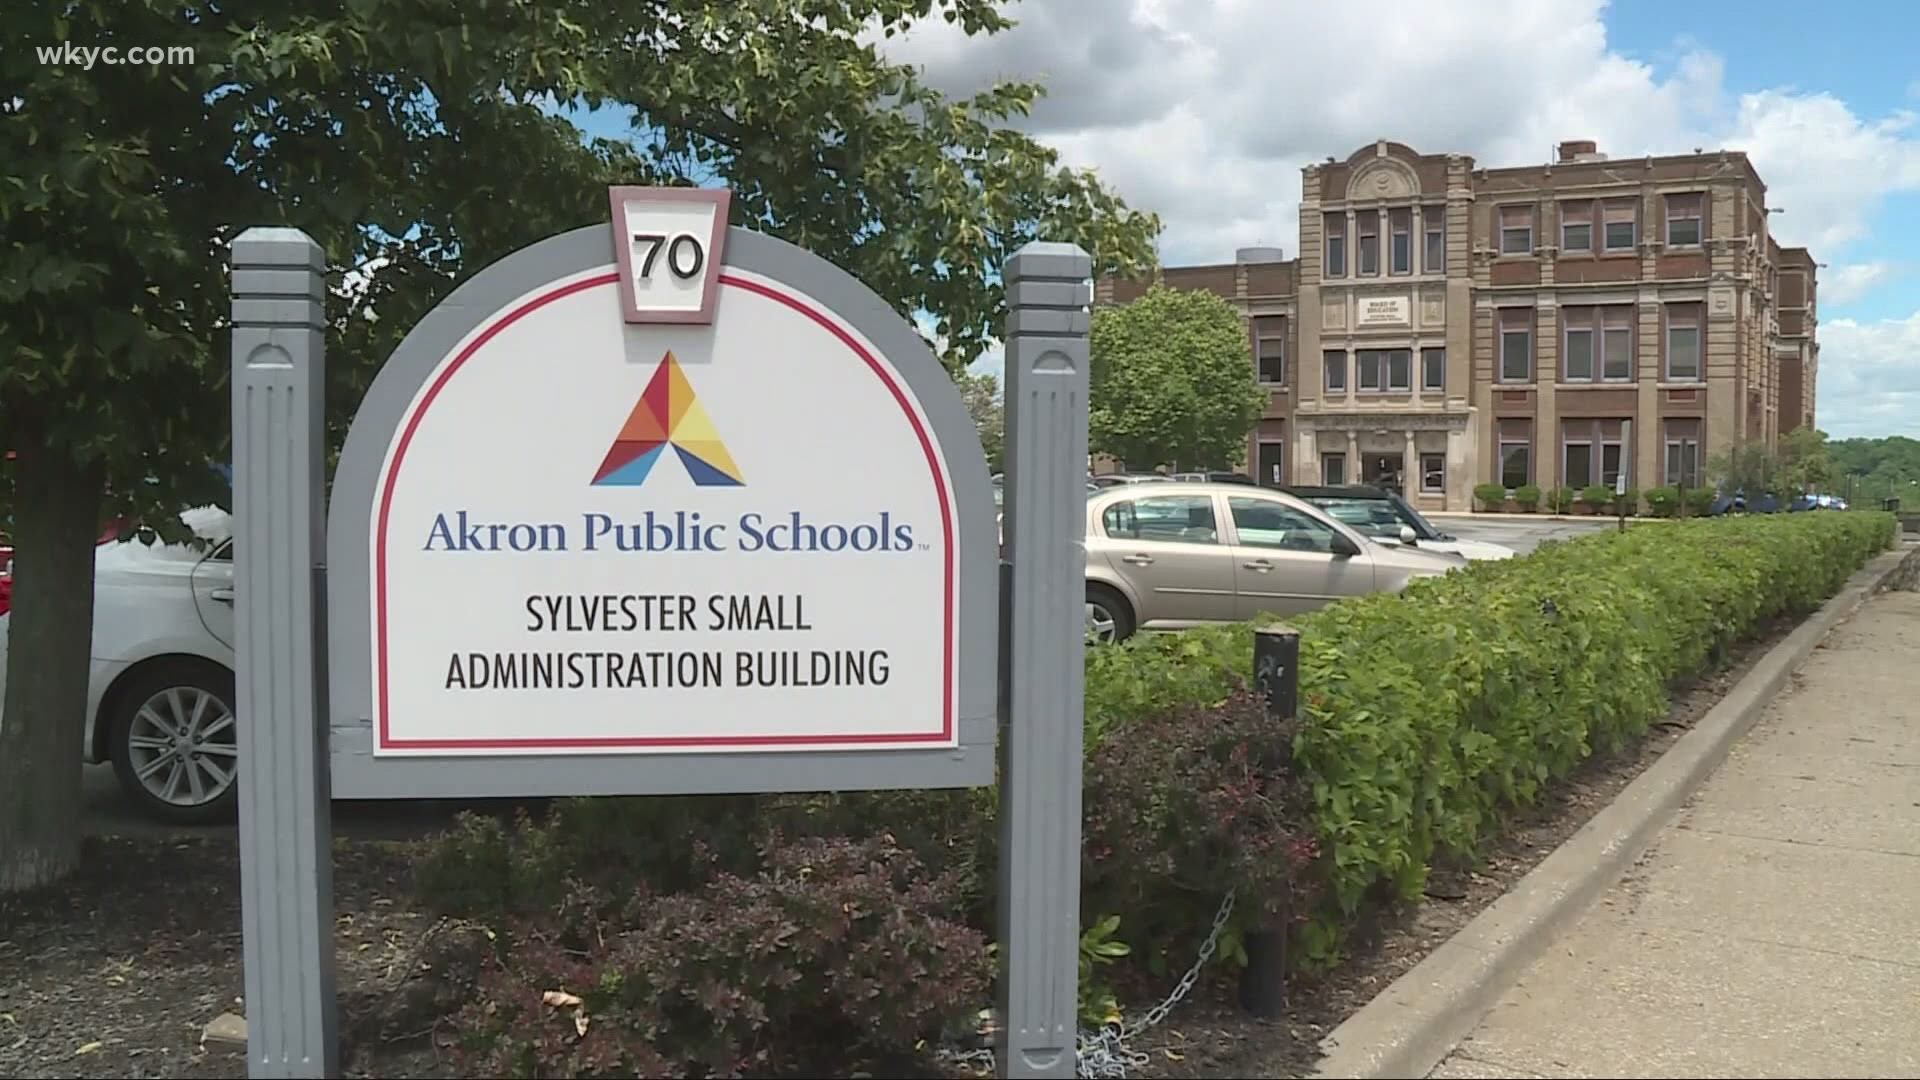 Akron Public Schools Calendar 2021 Akron Public Schools to stay remote for rest of calendar year